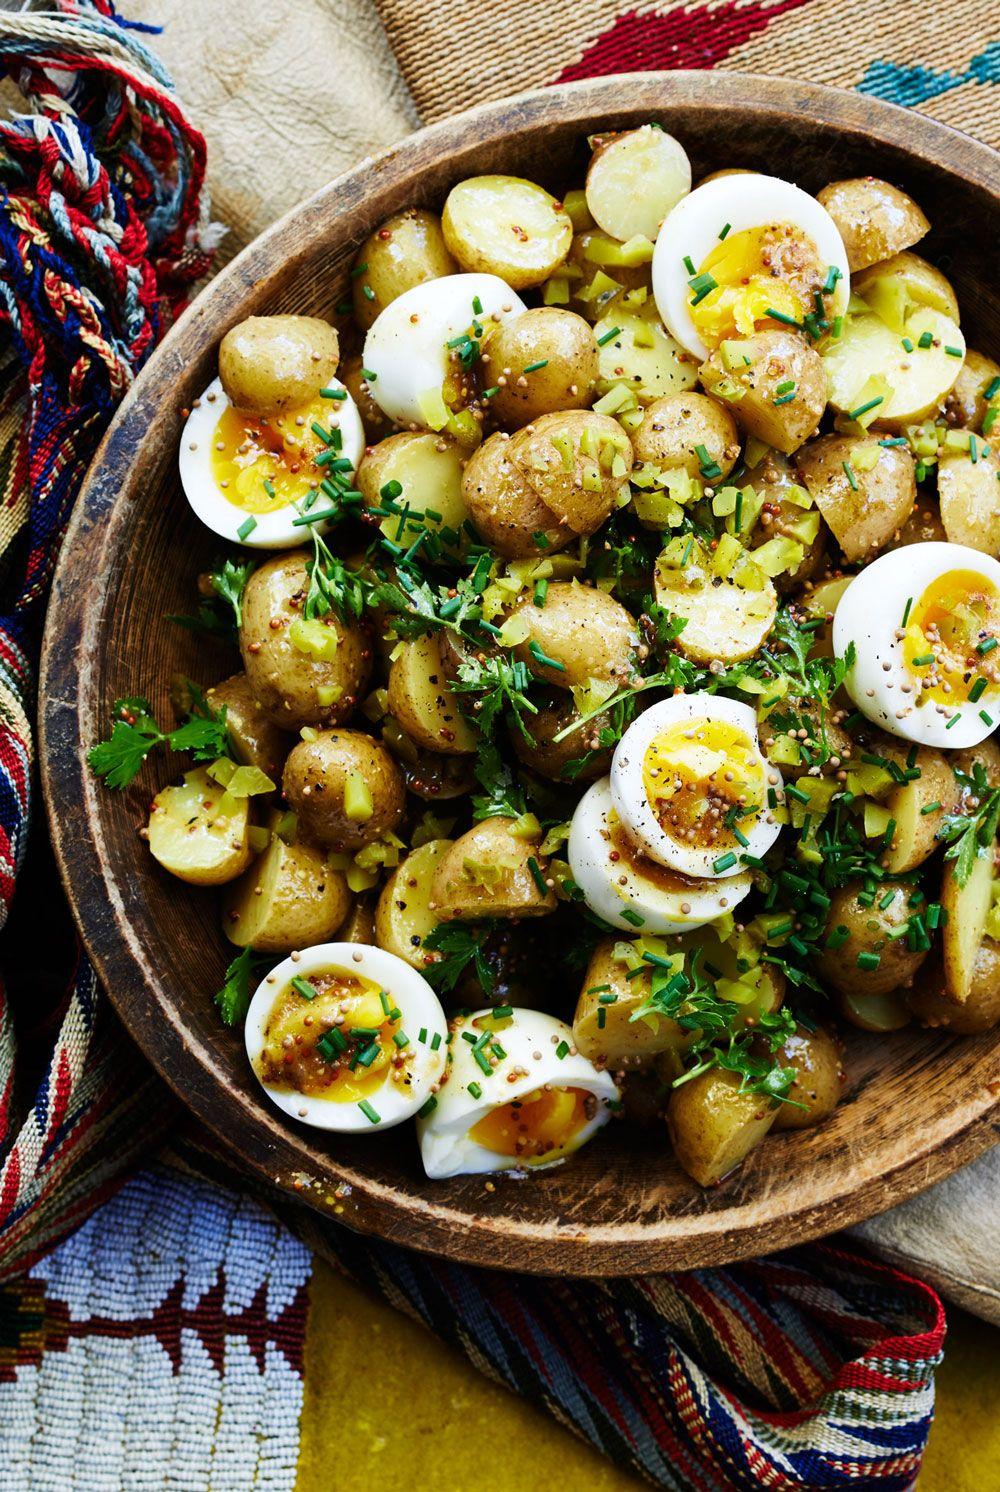 Potato Salad Recipe With Egg Vinegar Dressing